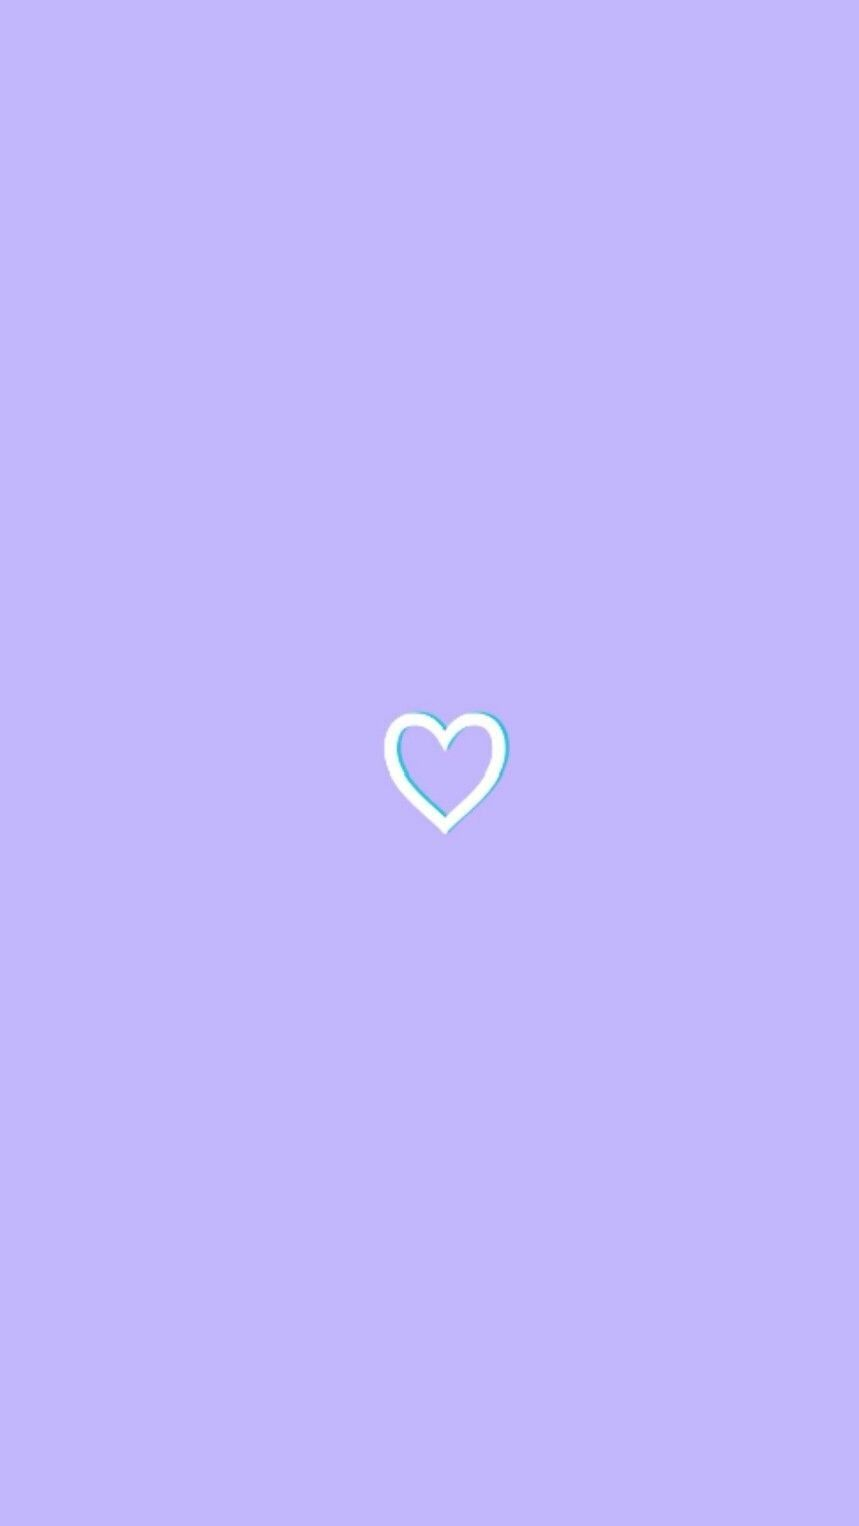 Lavender Heart Wallpaper Tumblr Lockscreen Purple Wallpaper Iphone Purple Wallpaper